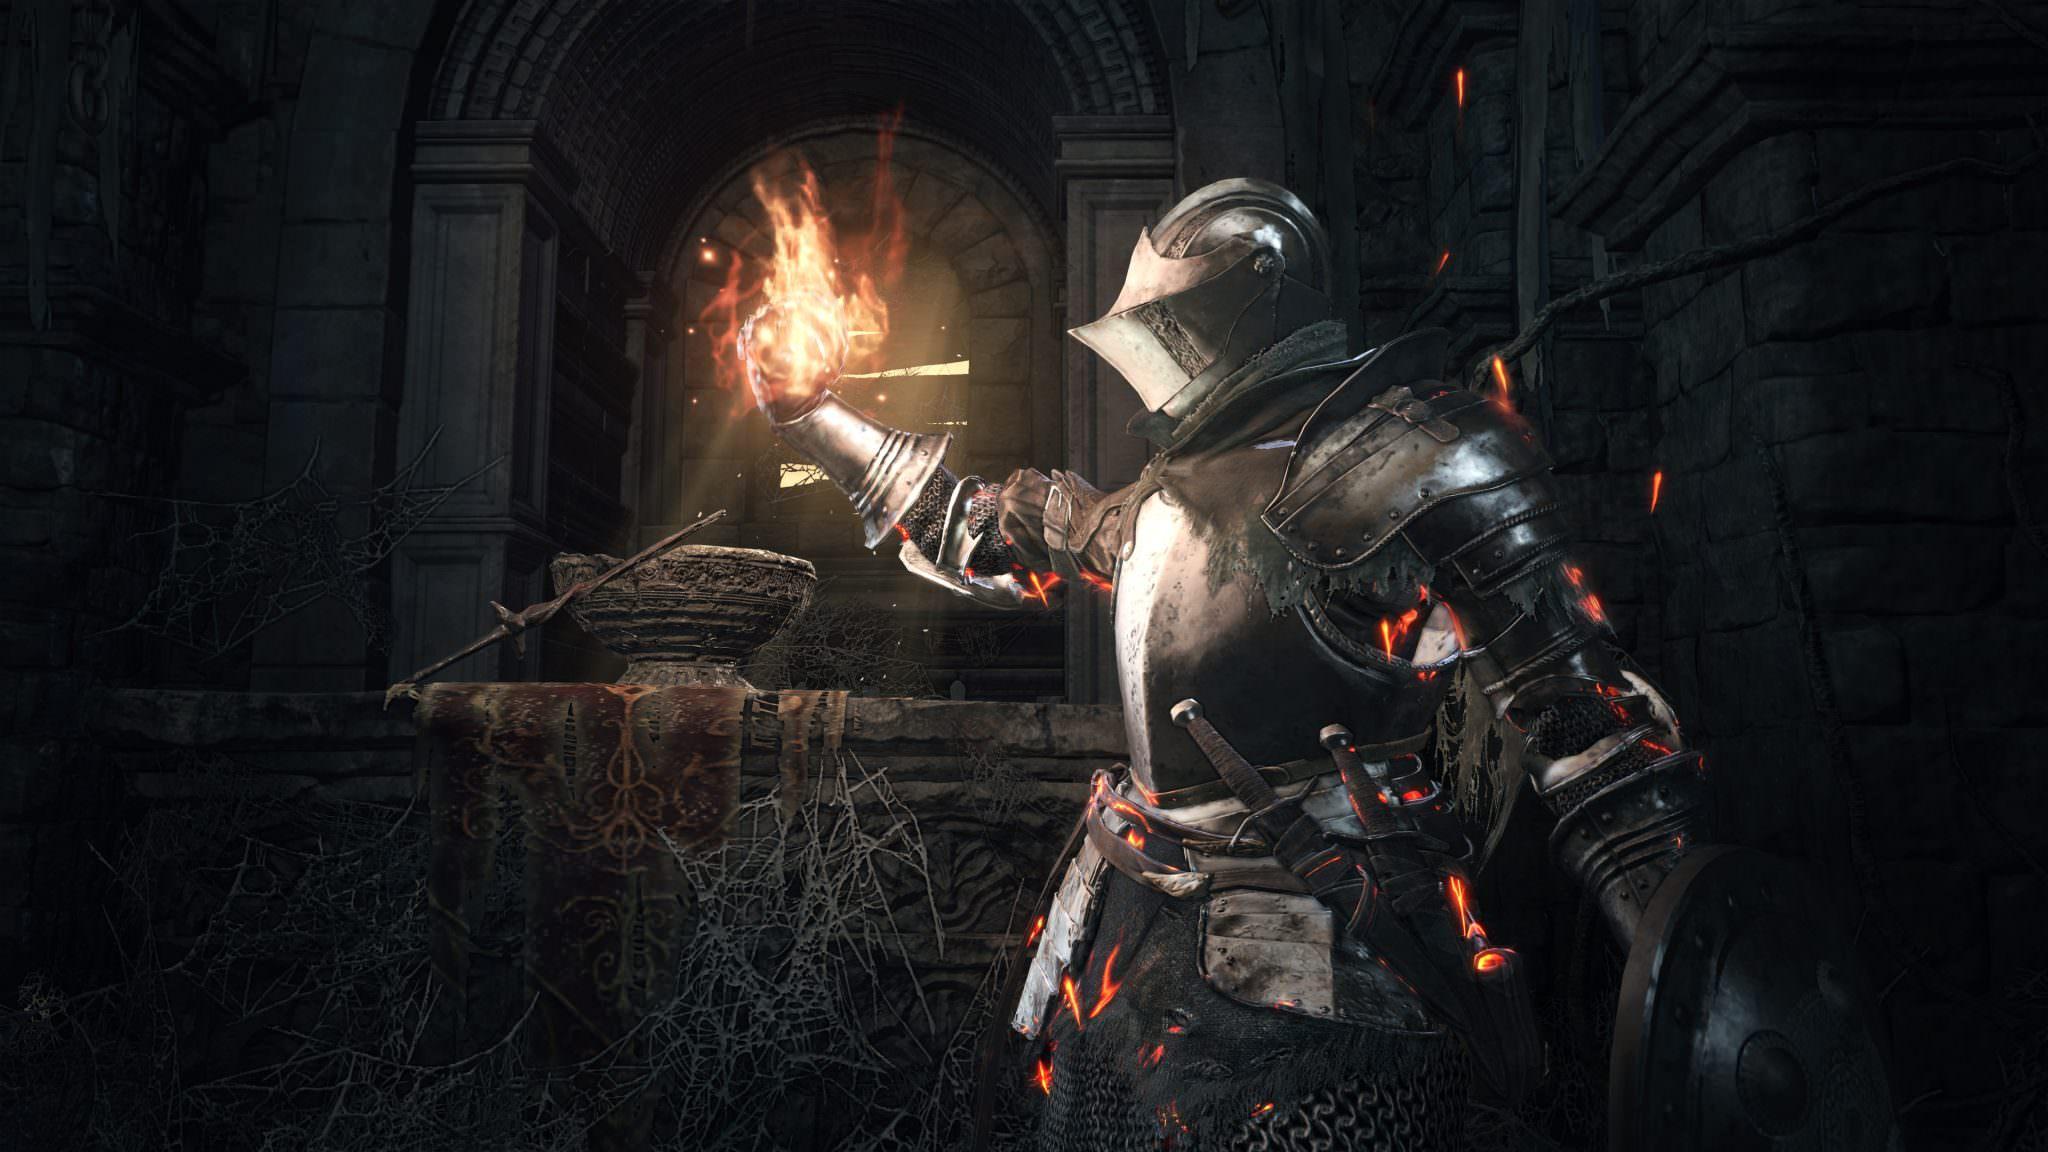 Dark-Souls-III-3-screenshot-17